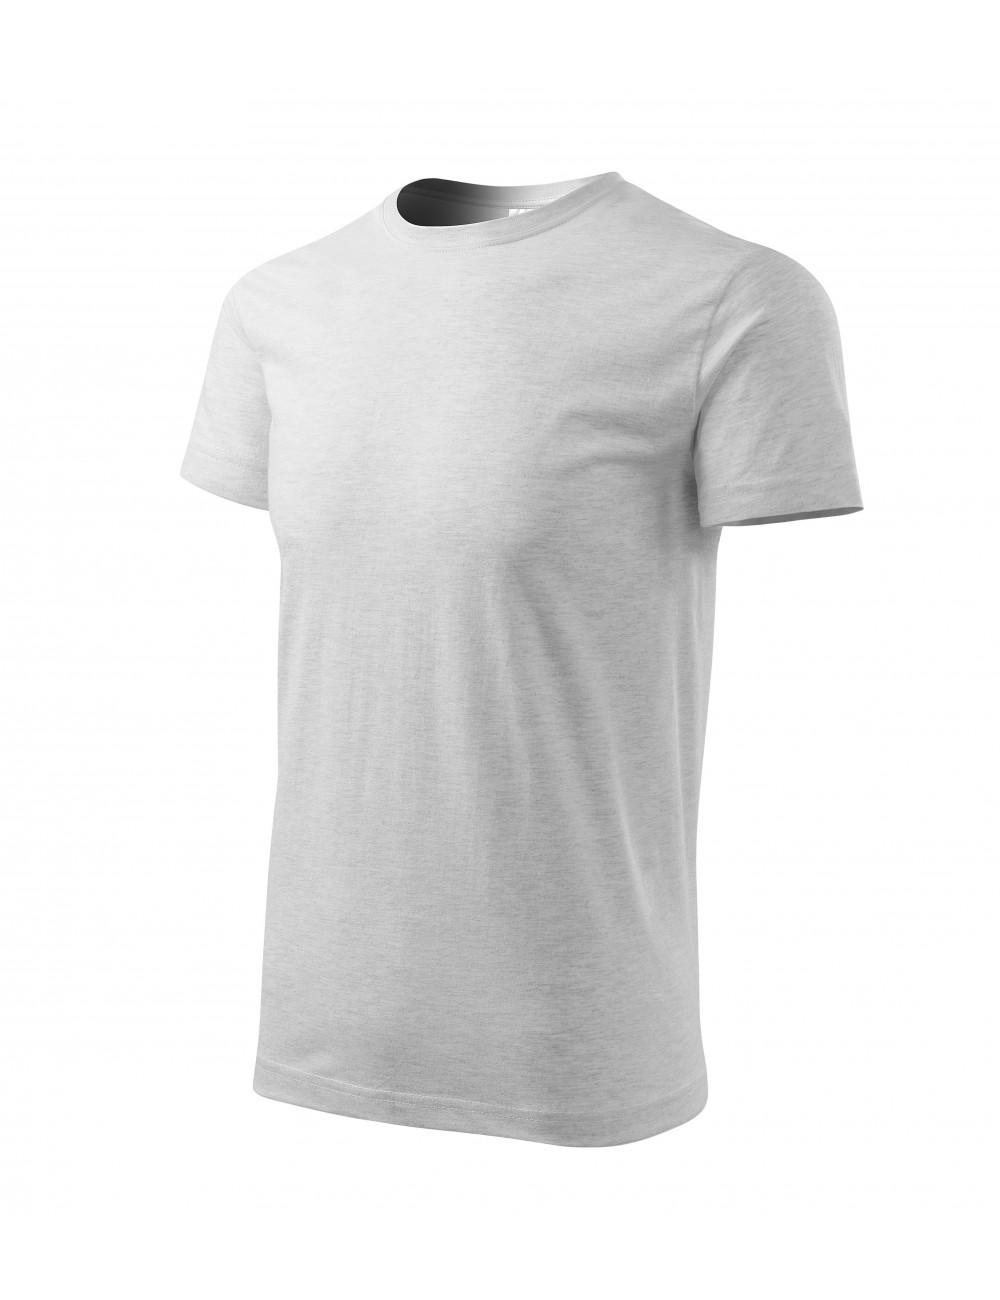 Adler MALFINI Koszulka unisex Heavy New 137 jasnoszary melanż